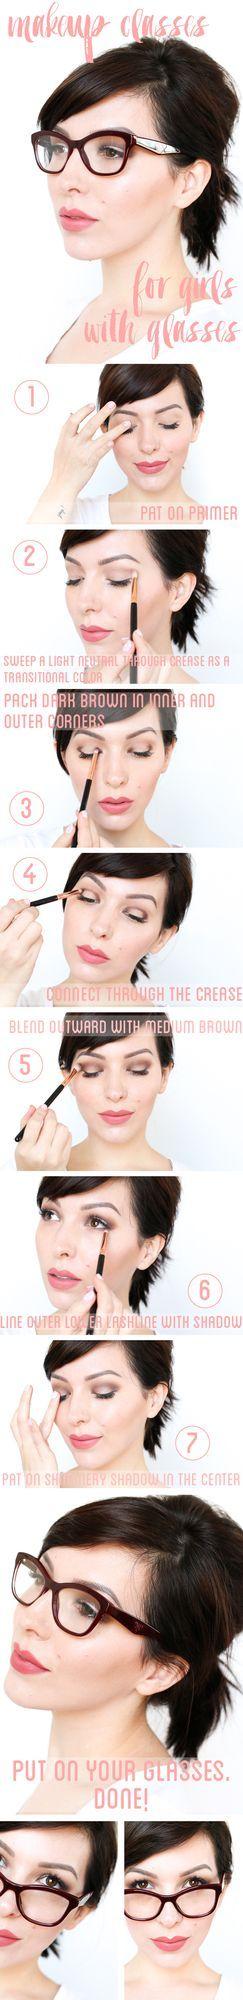 Makeup Tutorial For Girls With Glasses | keiko lynn | Bloglovin'